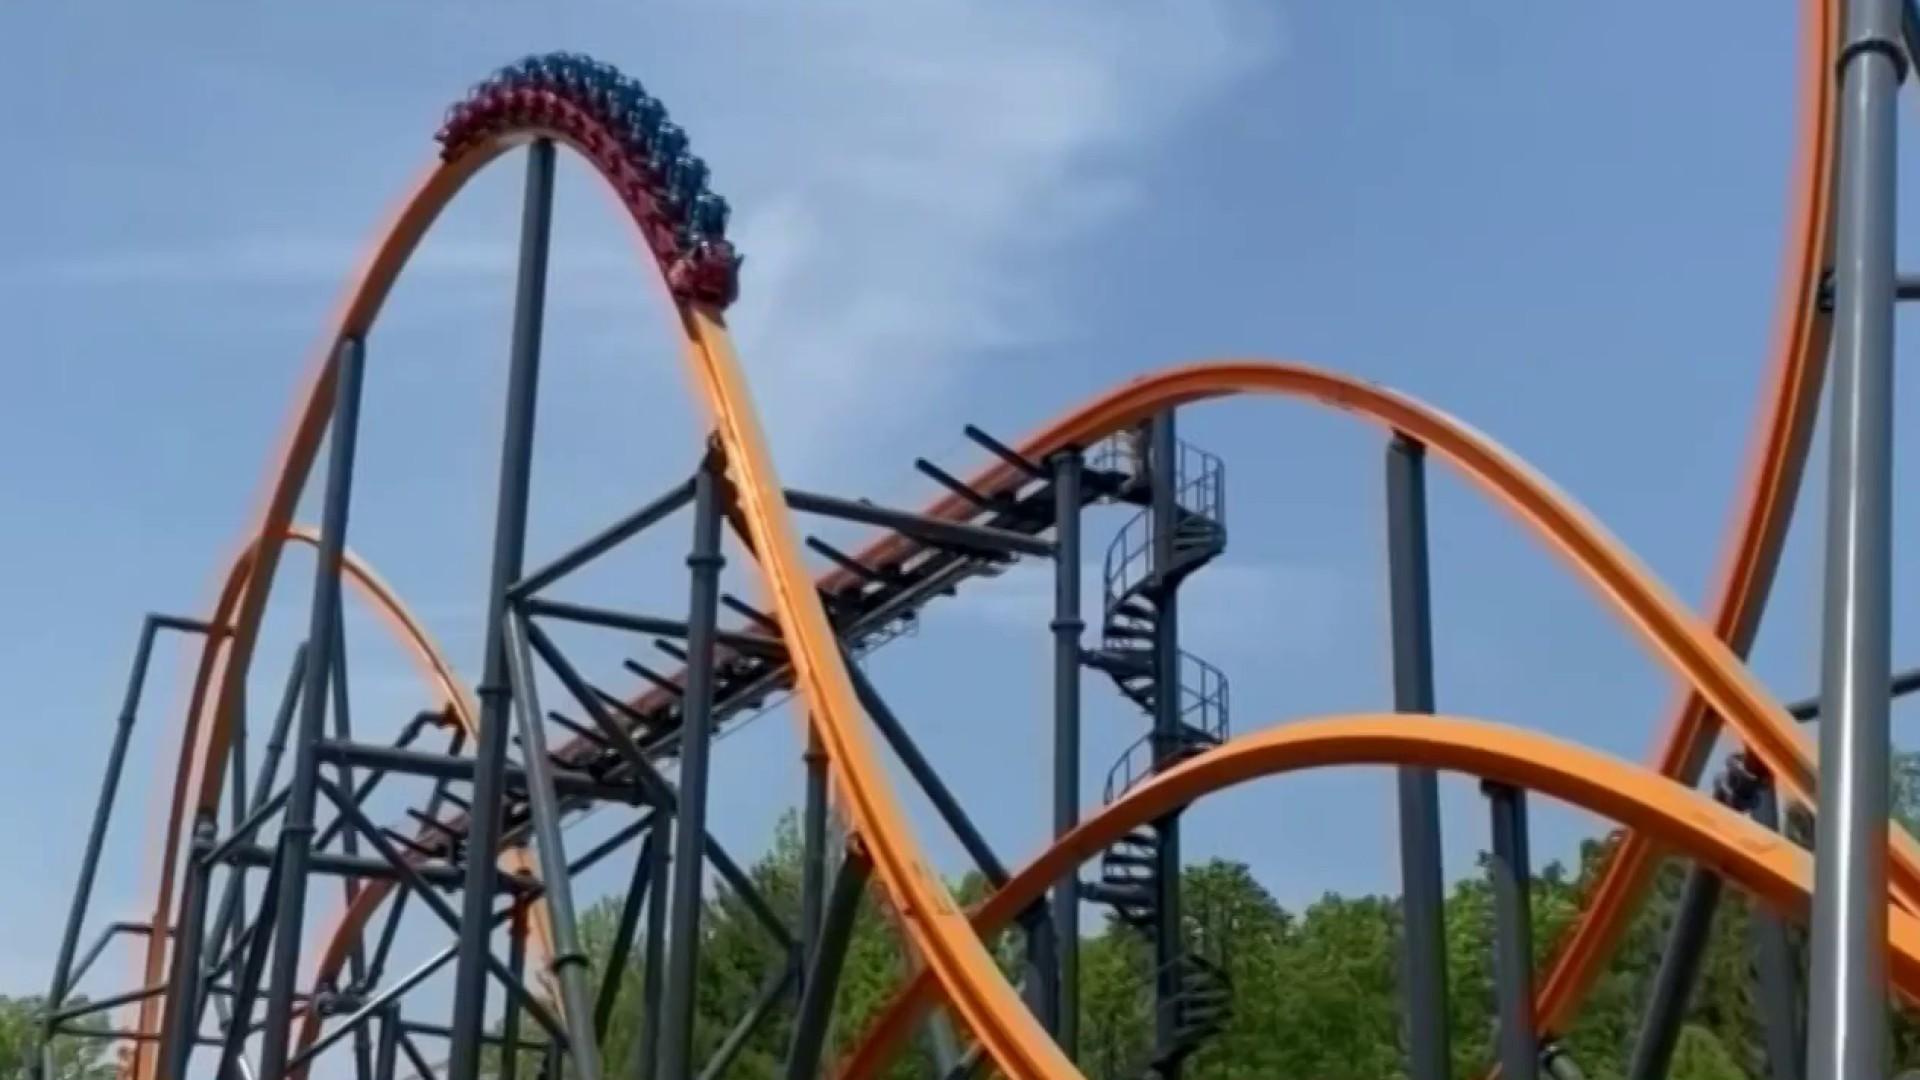 Jersey Devil Coaster Opens At Six Flags Great Adventure Nbc10 Philadelphia